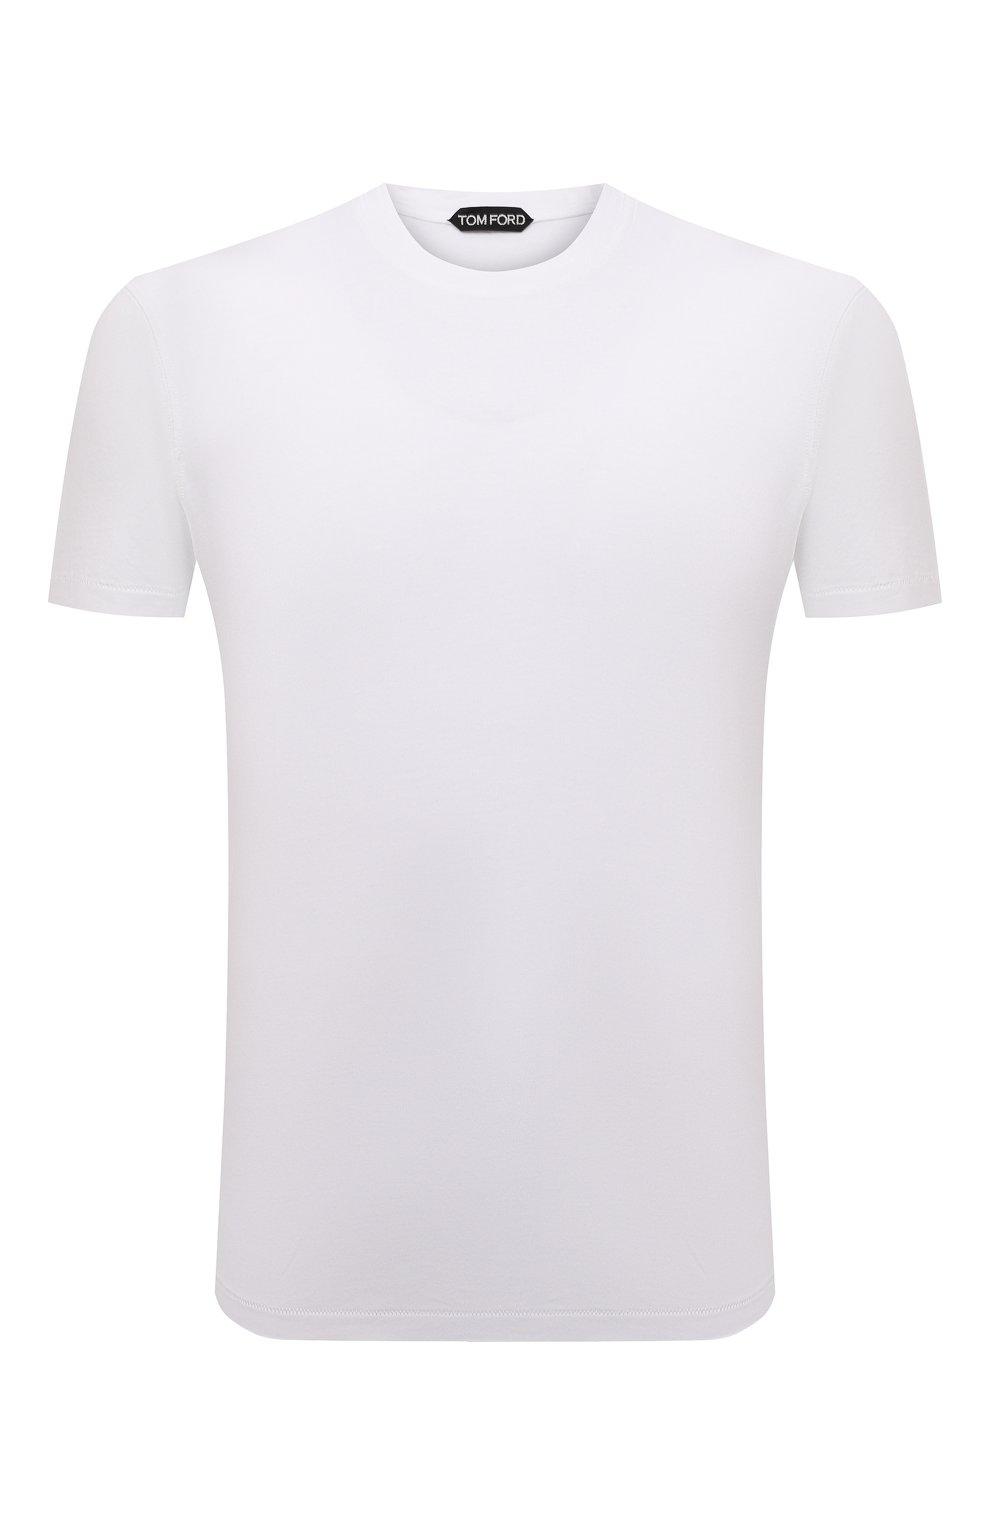 Мужская футболка TOM FORD белого цвета, арт. BT229/TFJ950 | Фото 1